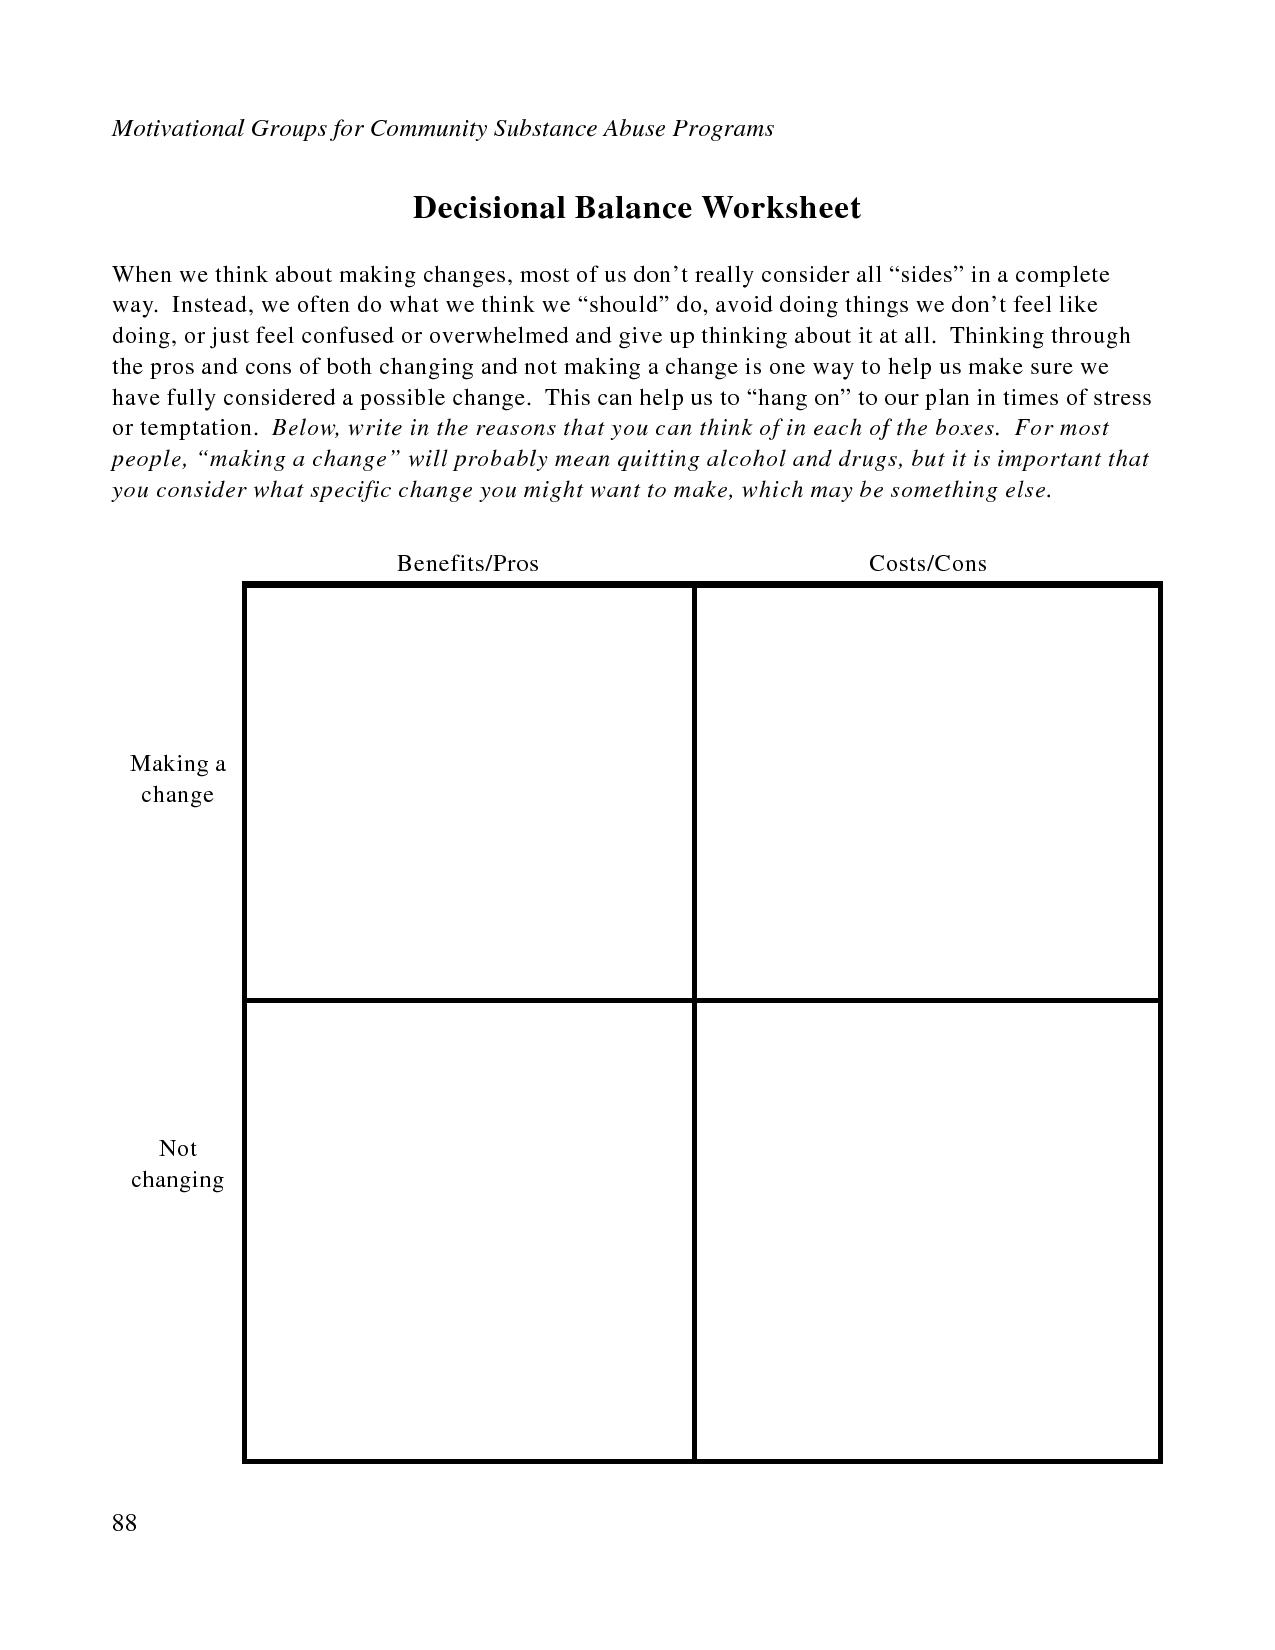 Free Printable Dbt Worksheets | Decisional Balance Worksheet - Pdf - Free Printable Mental Health Worksheets